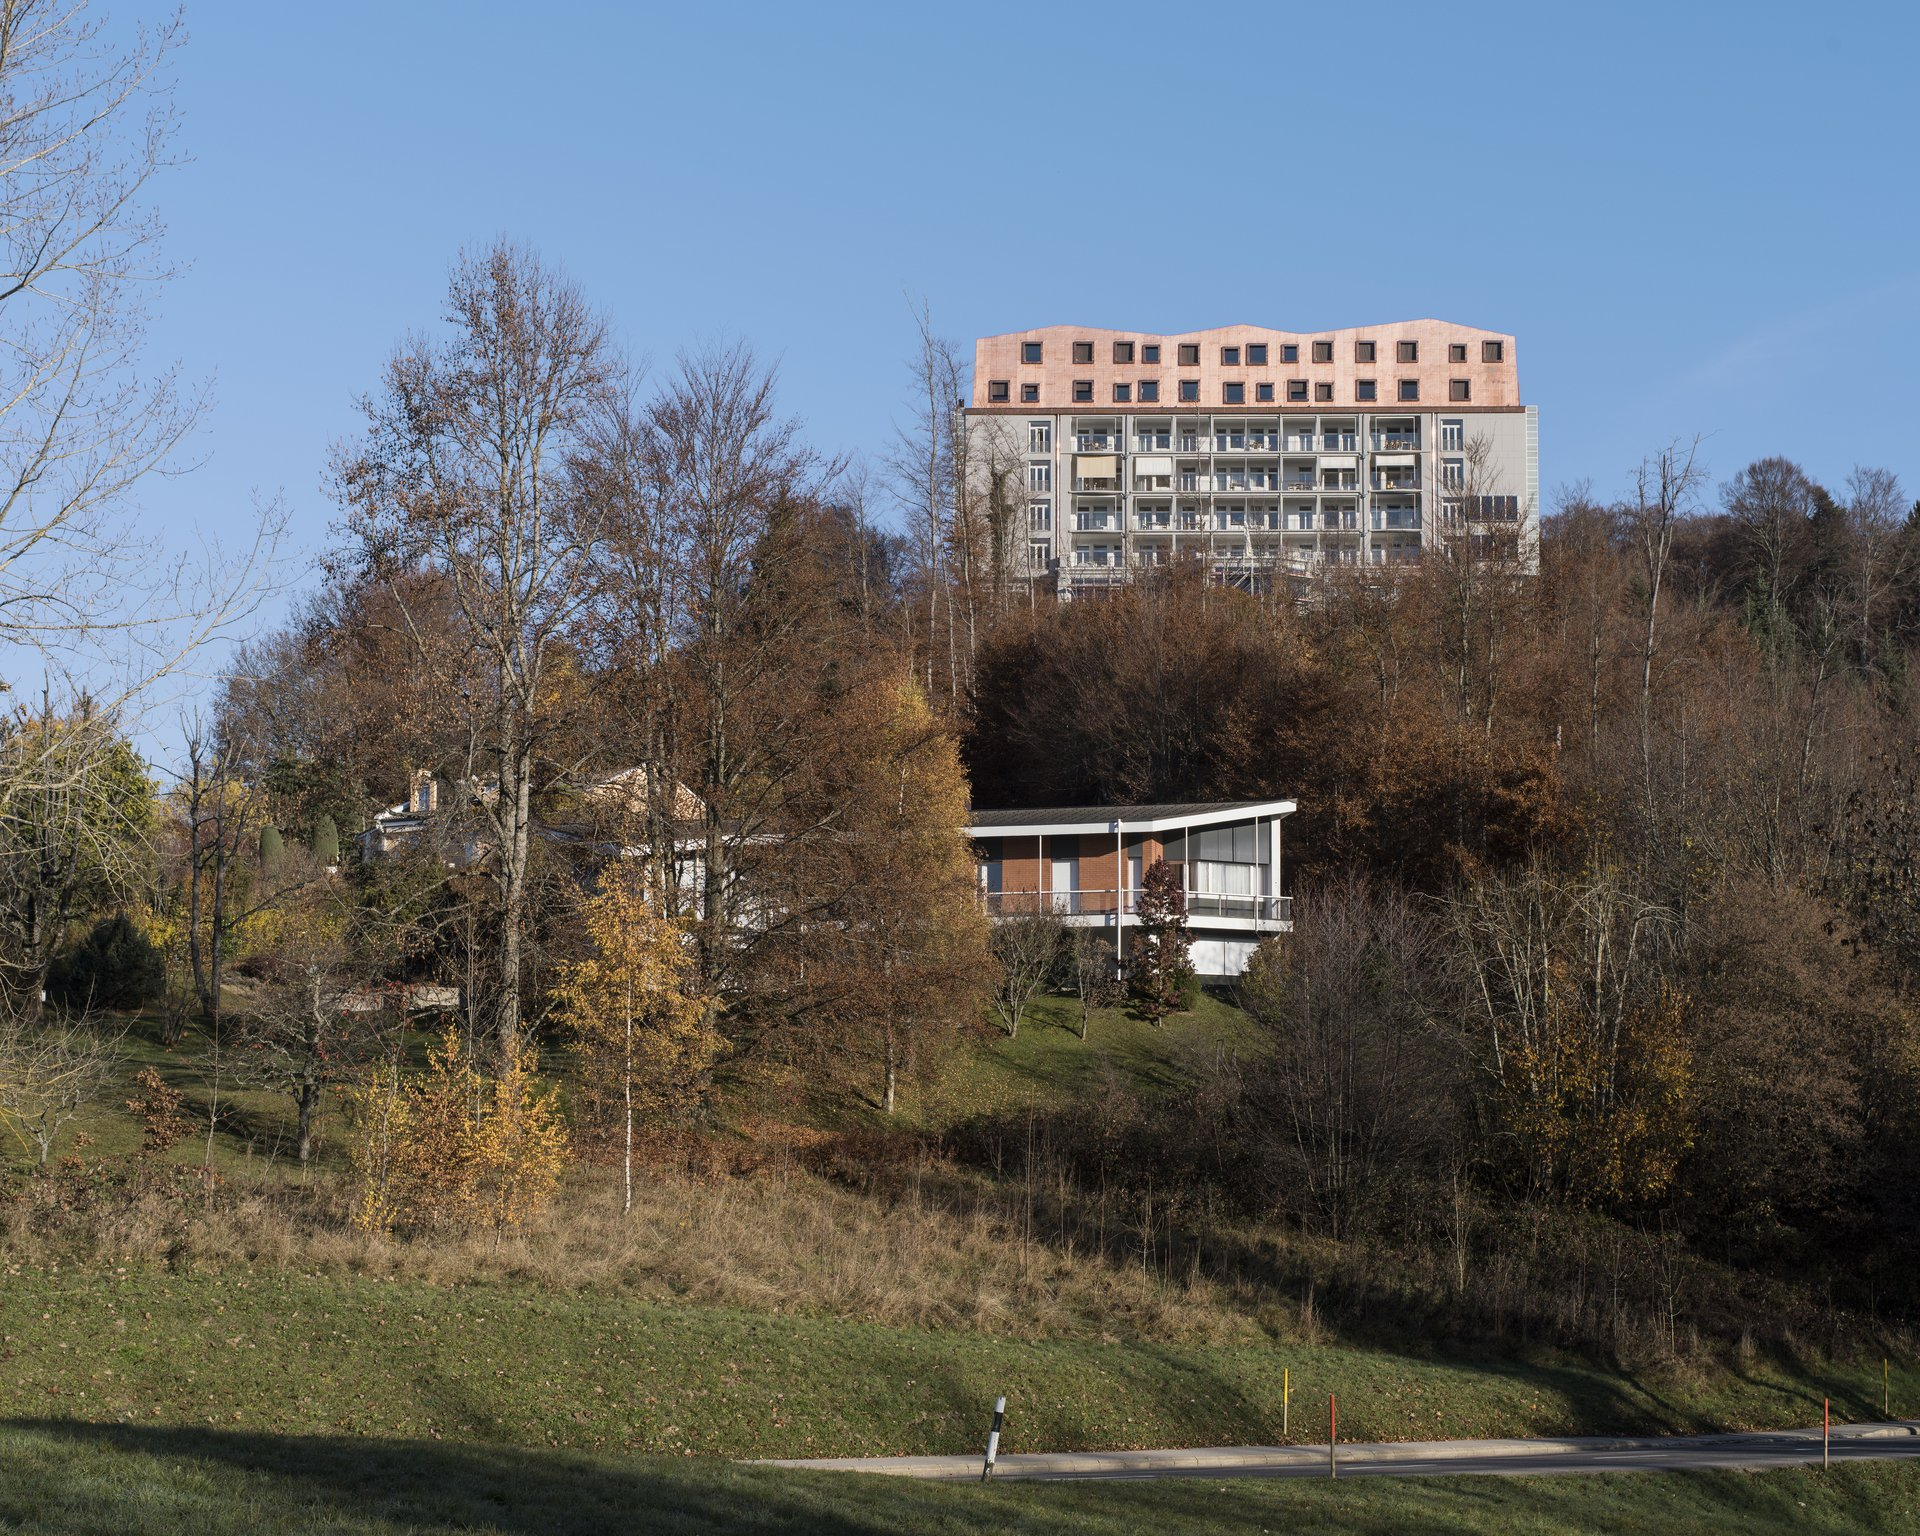 Mehrgeschossiges Gebäude mit 2-geschossiger Aufstockung